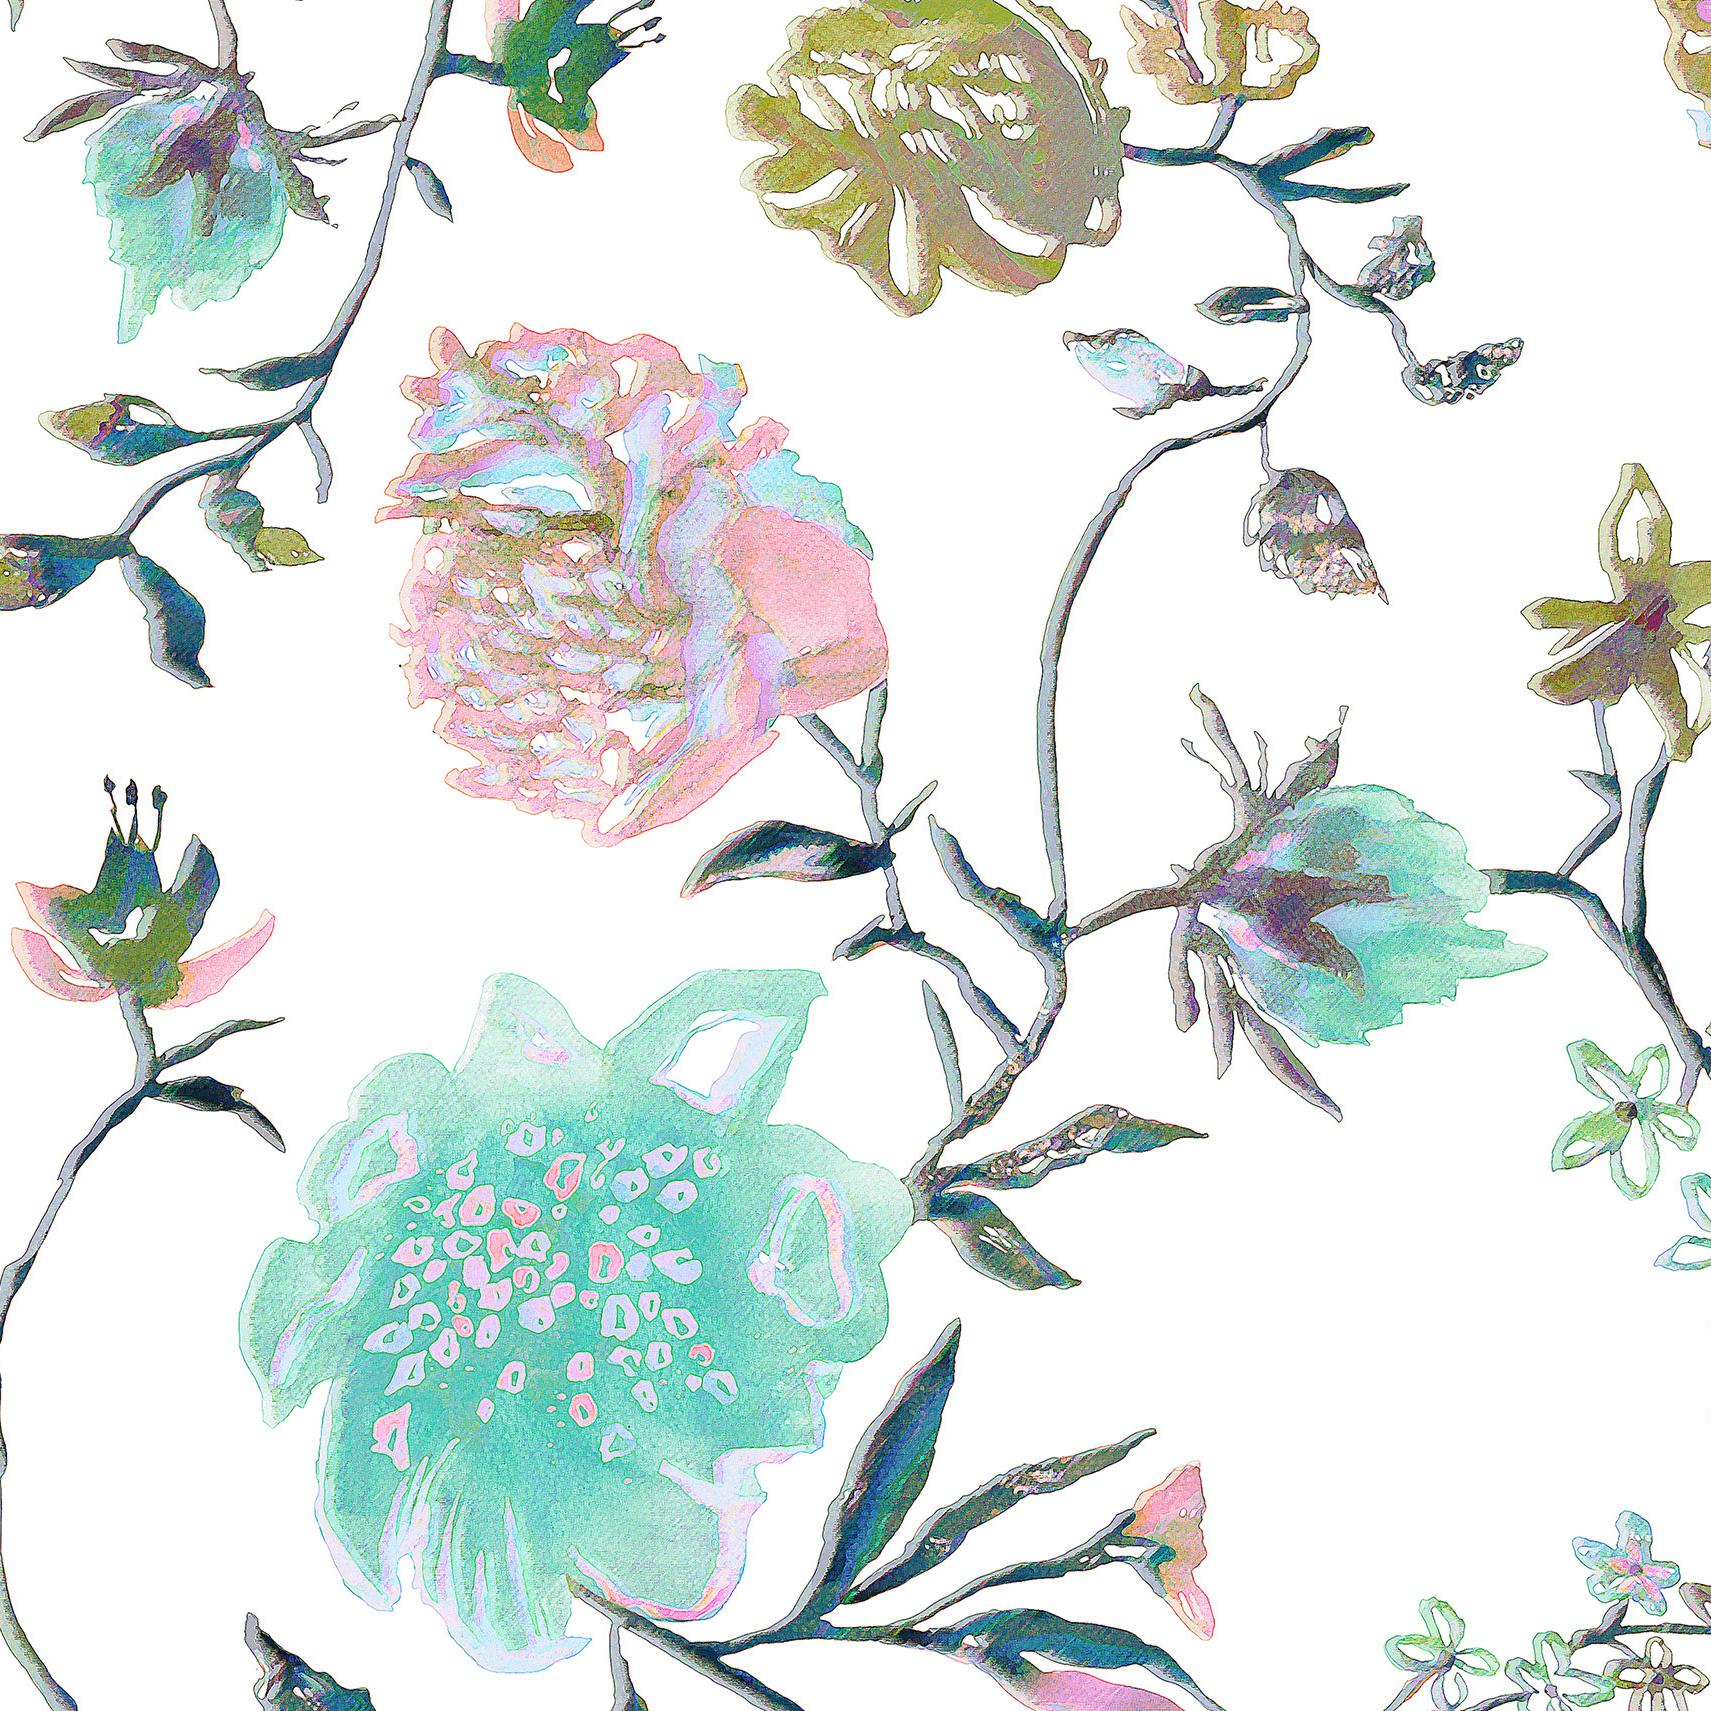 Carousel-&-Bazaar_Floral-Vines_white copy.jpg